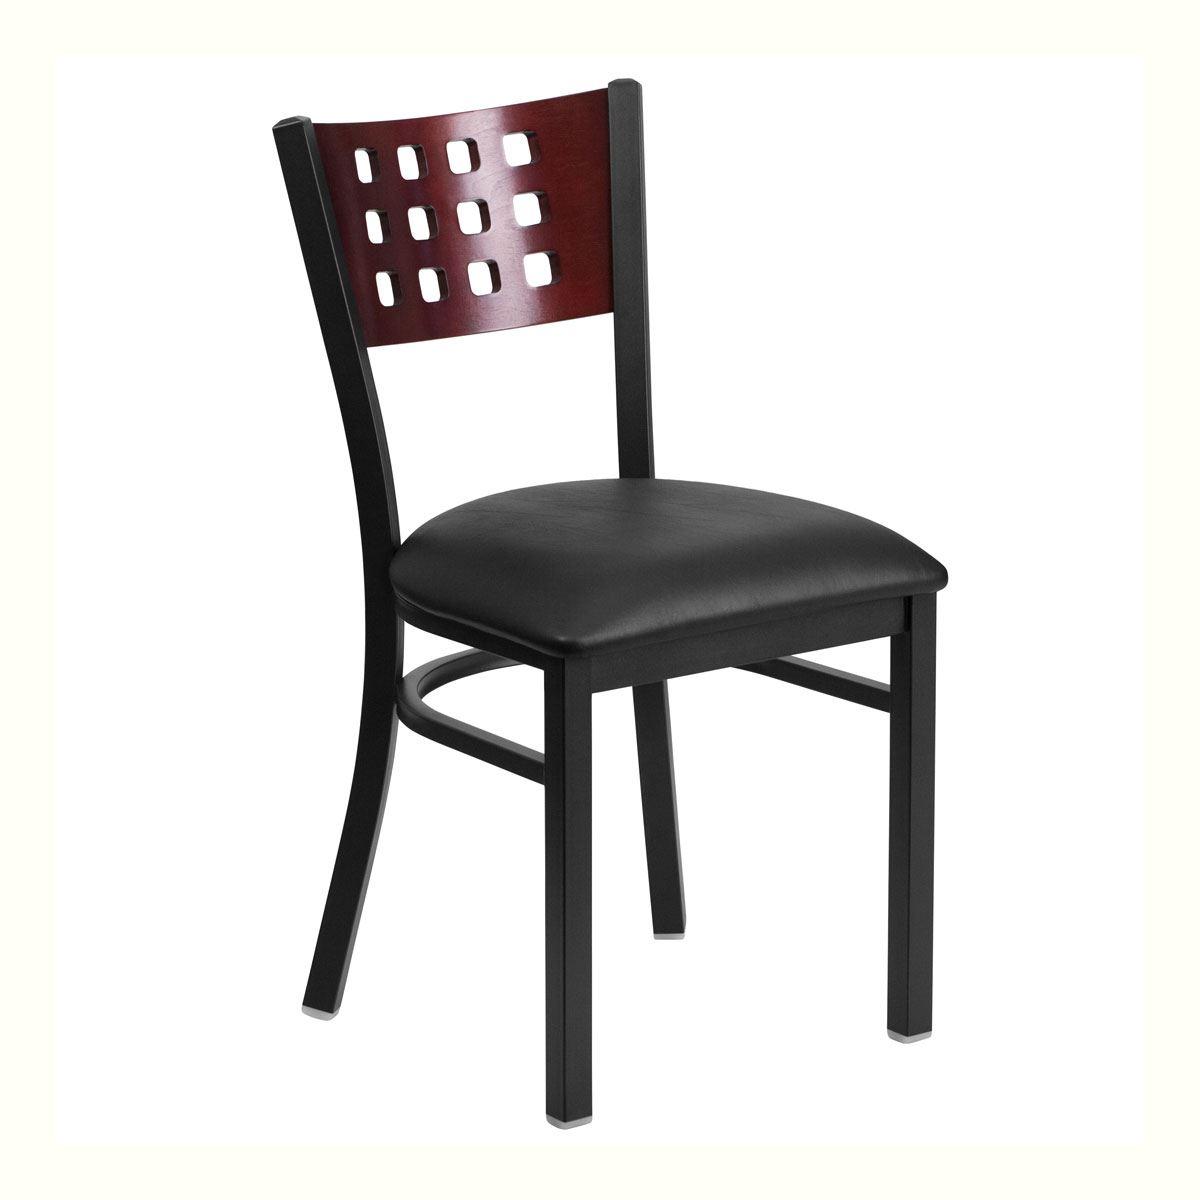 12 Square Black Seat Chair